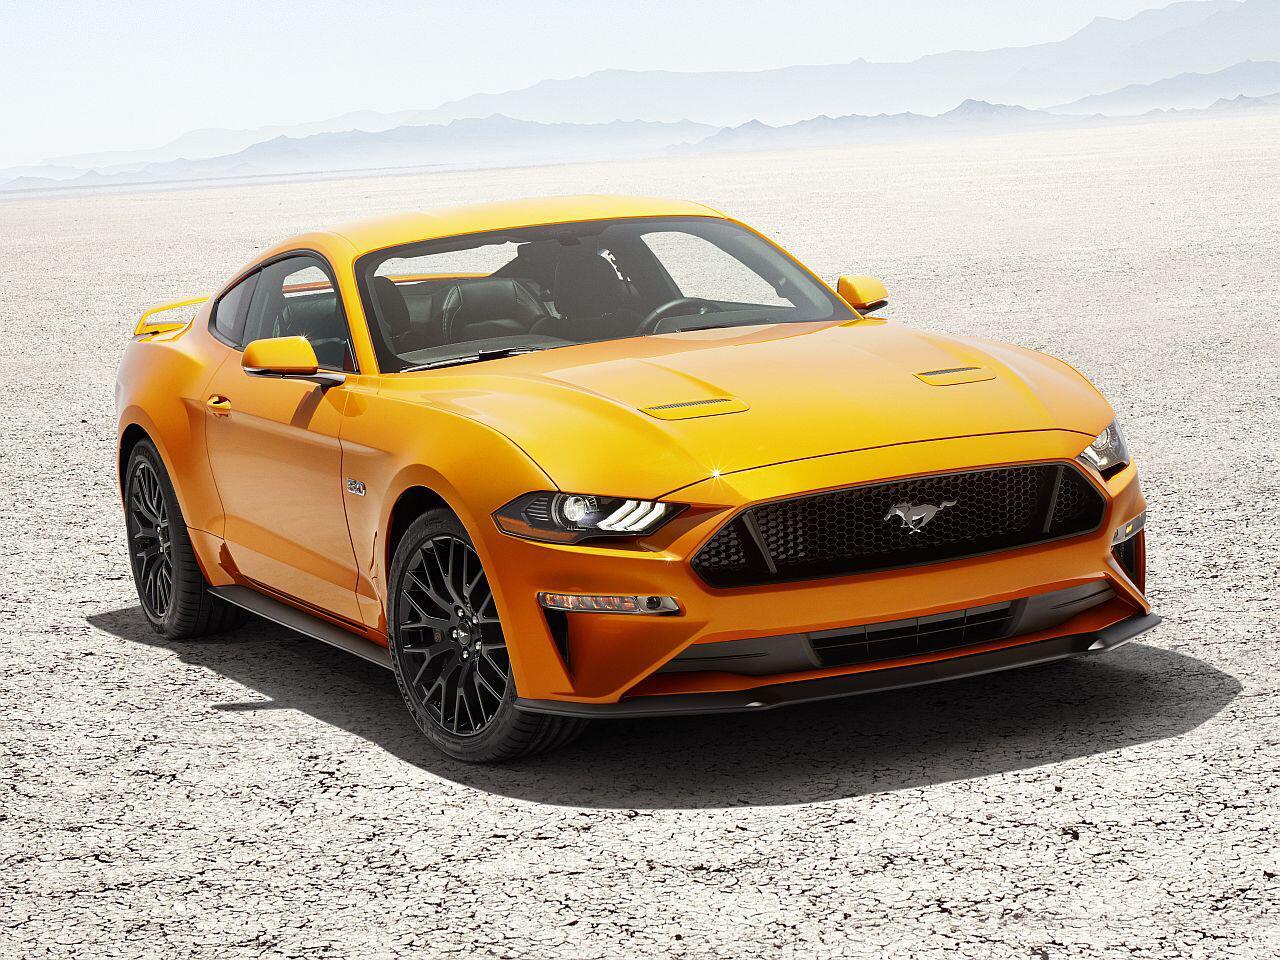 Bild zu Platz 2 Sportwagen: Ford Mustang